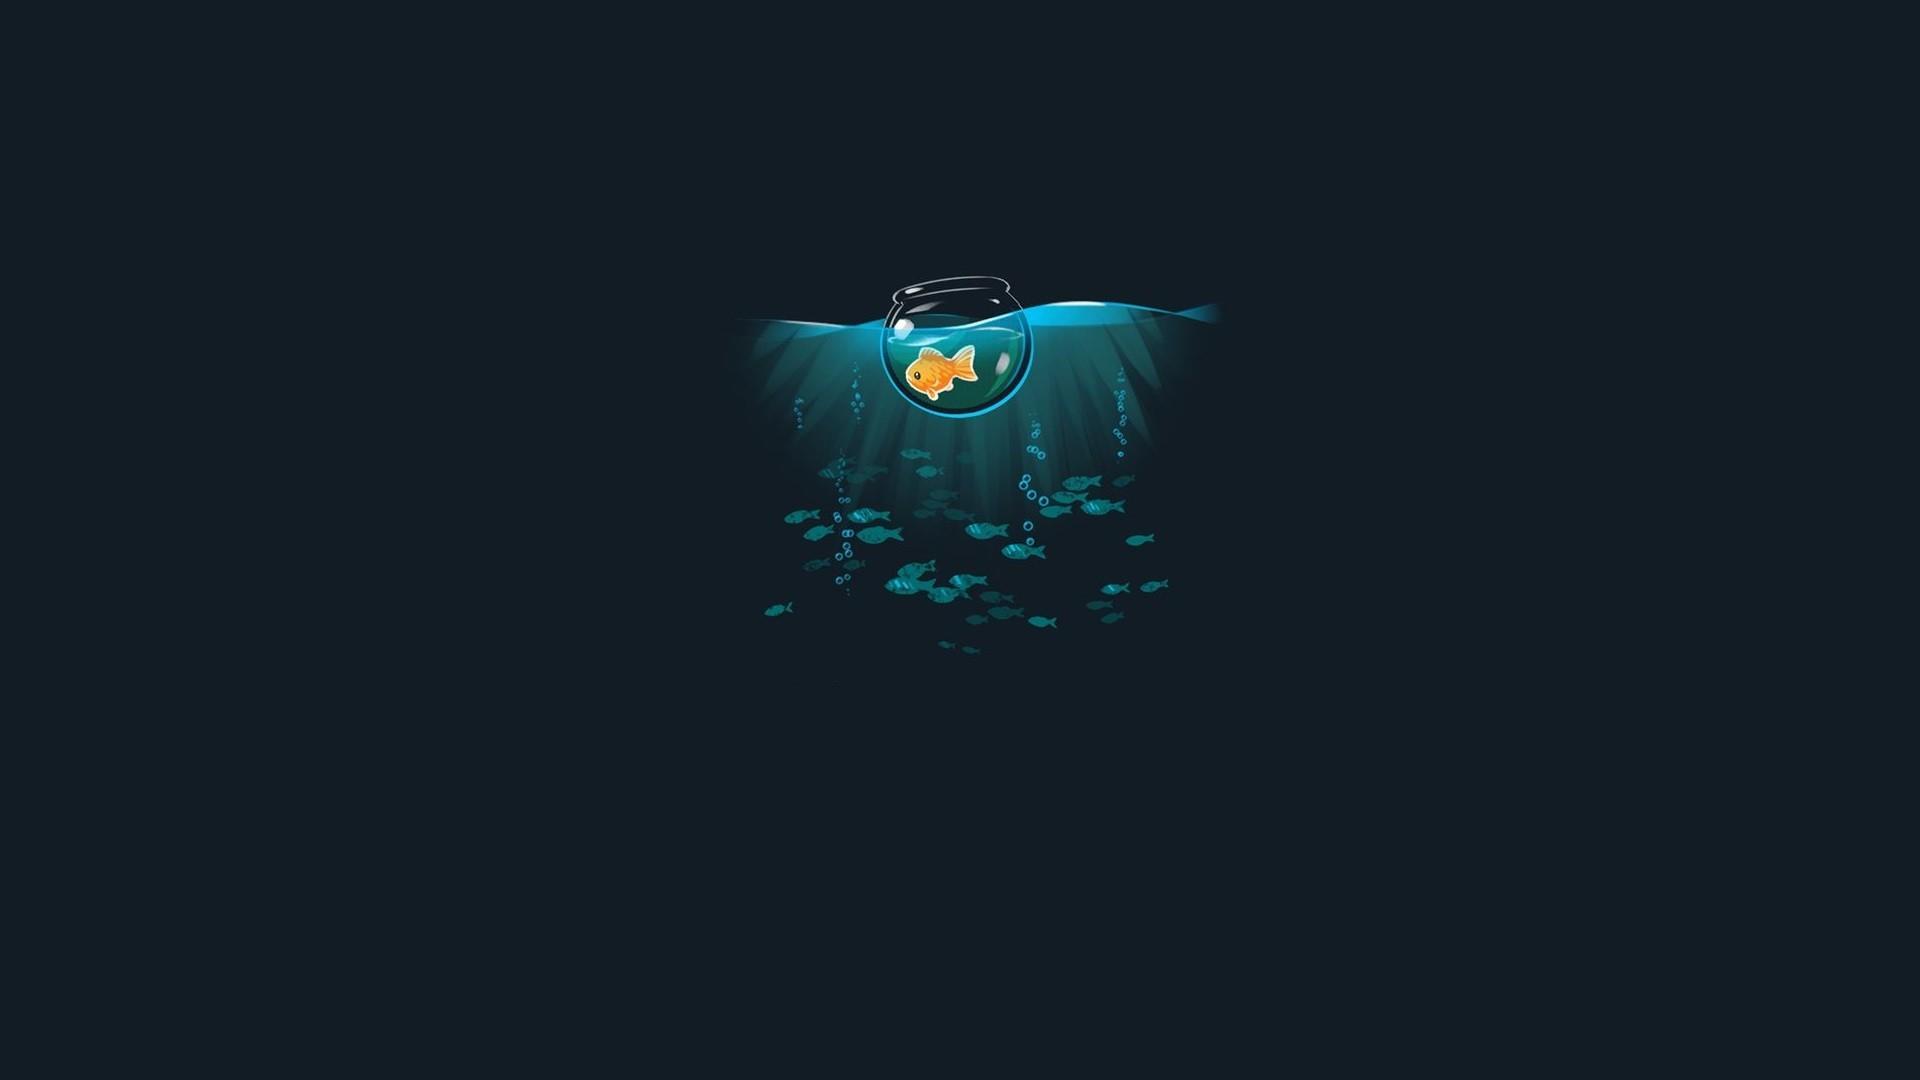 wallpaper : sea, minimalism, artwork, logo, fish, simple, threadless